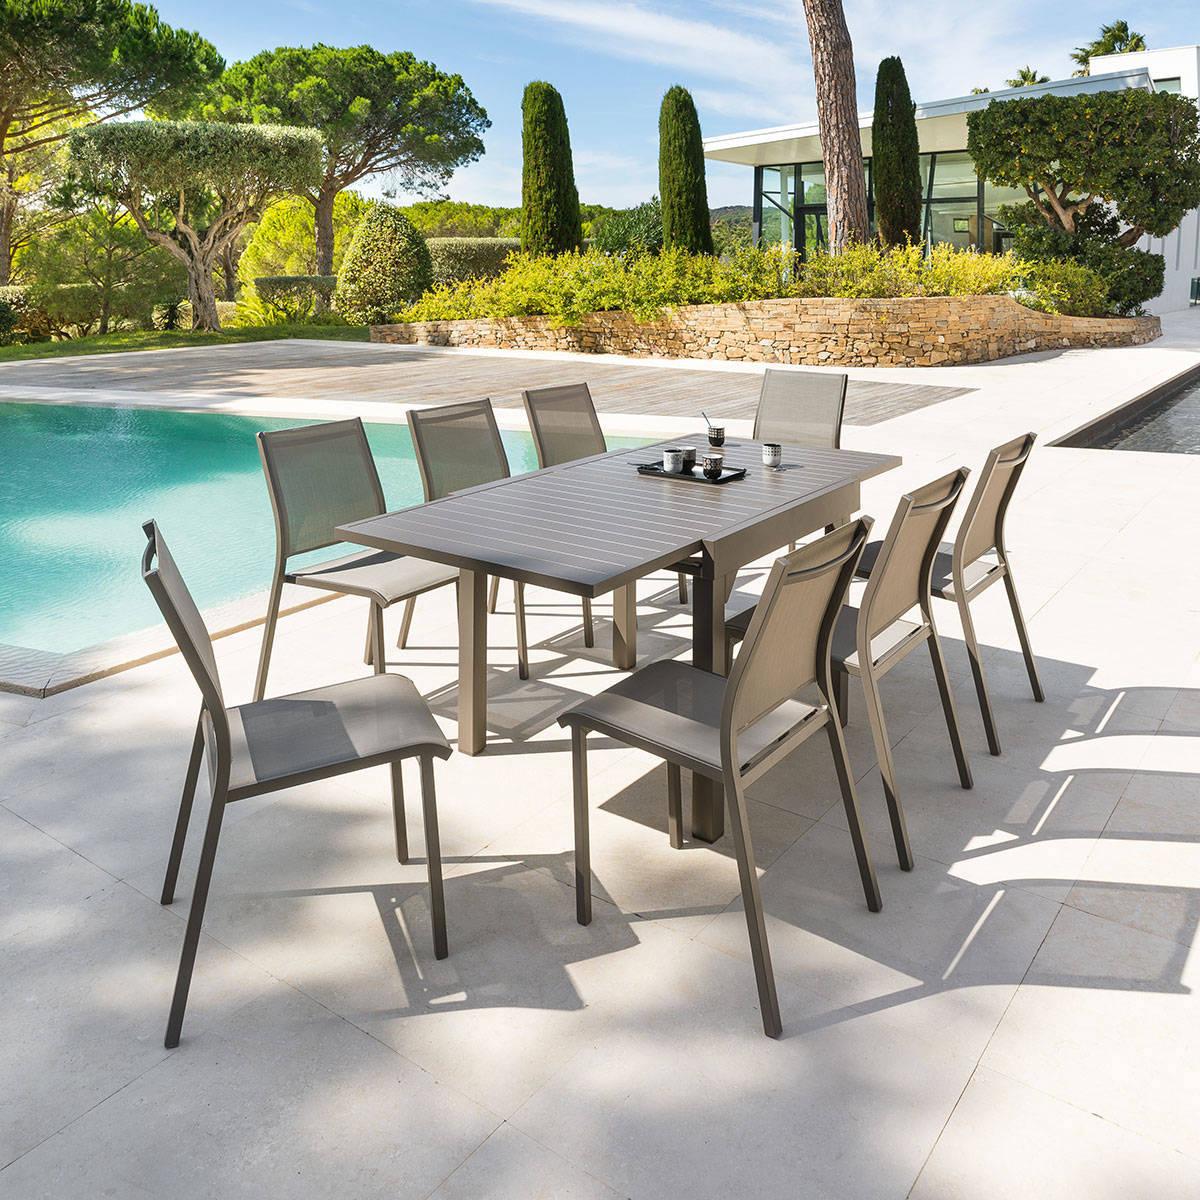 Table De Jardin Extensible Piazza Tonka Hespéride 8 Places concernant Chaise De Jardin Hesperide